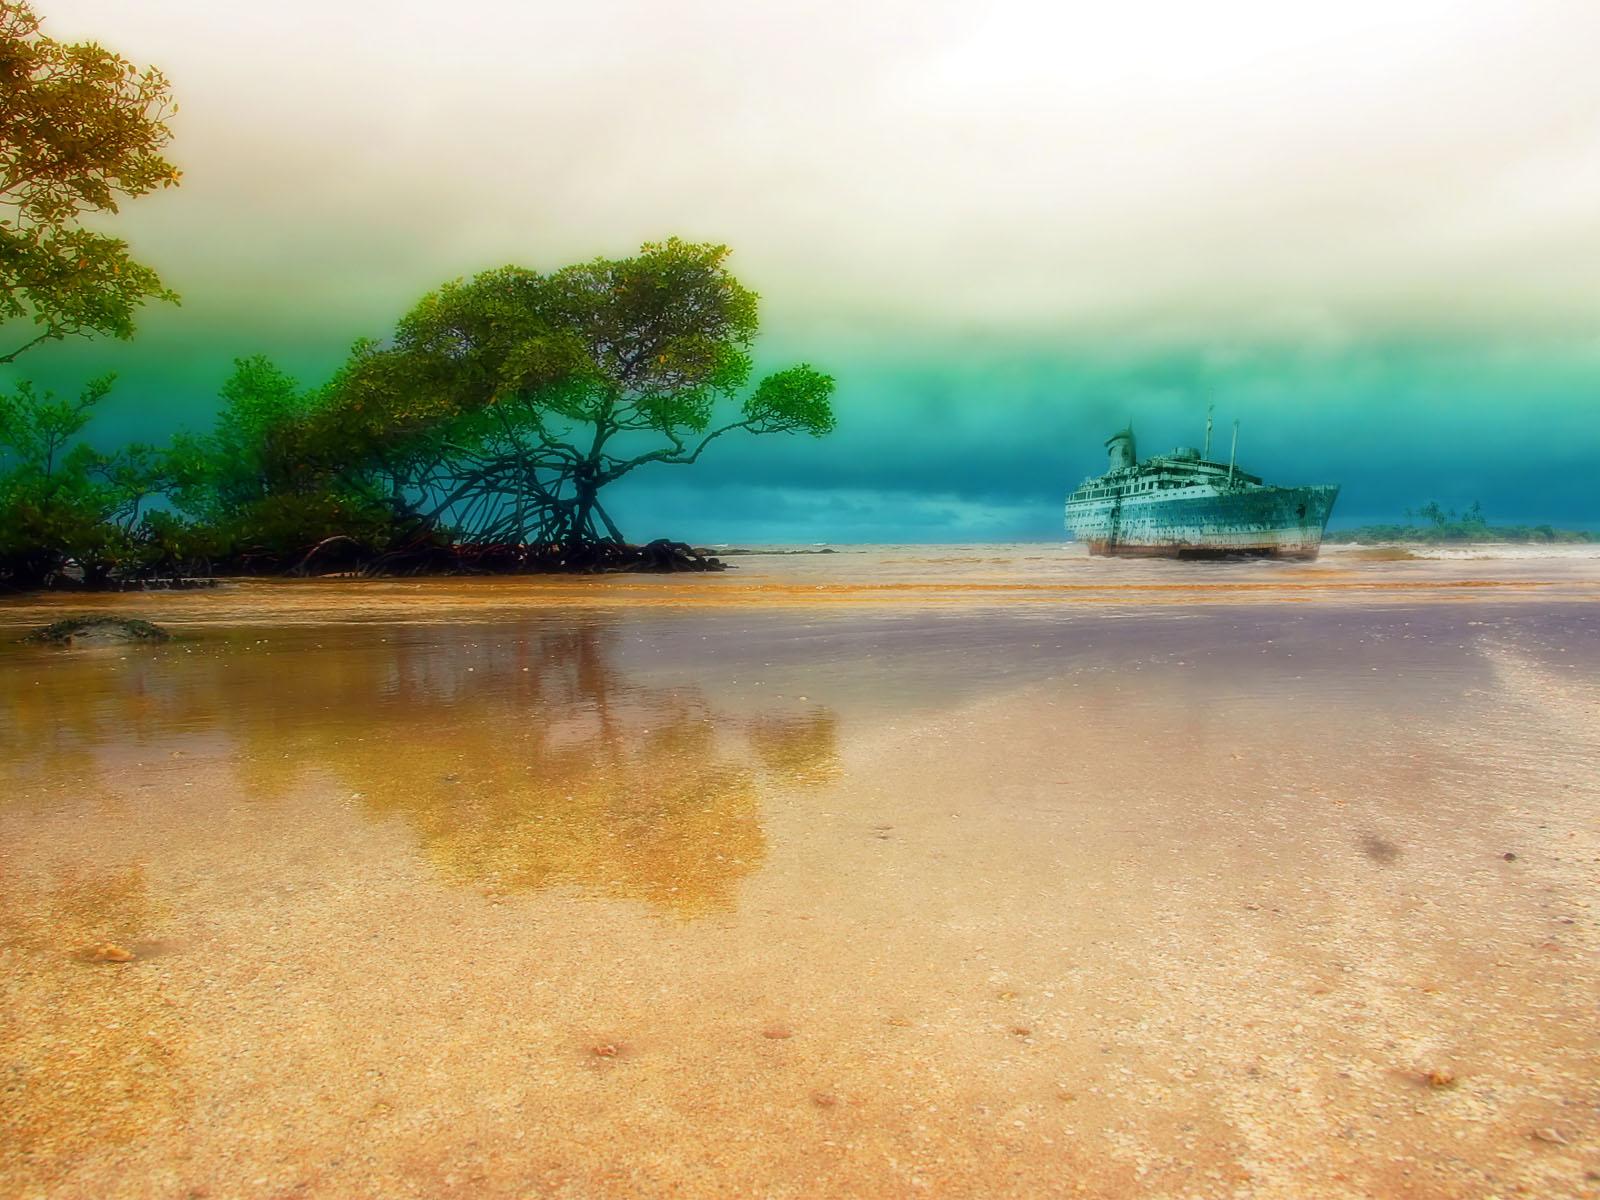 Fotografía - Playa  - Tropical - Hdr - Shipwreck - Mangrove - Pastel - Splendid Fondo de Pantalla